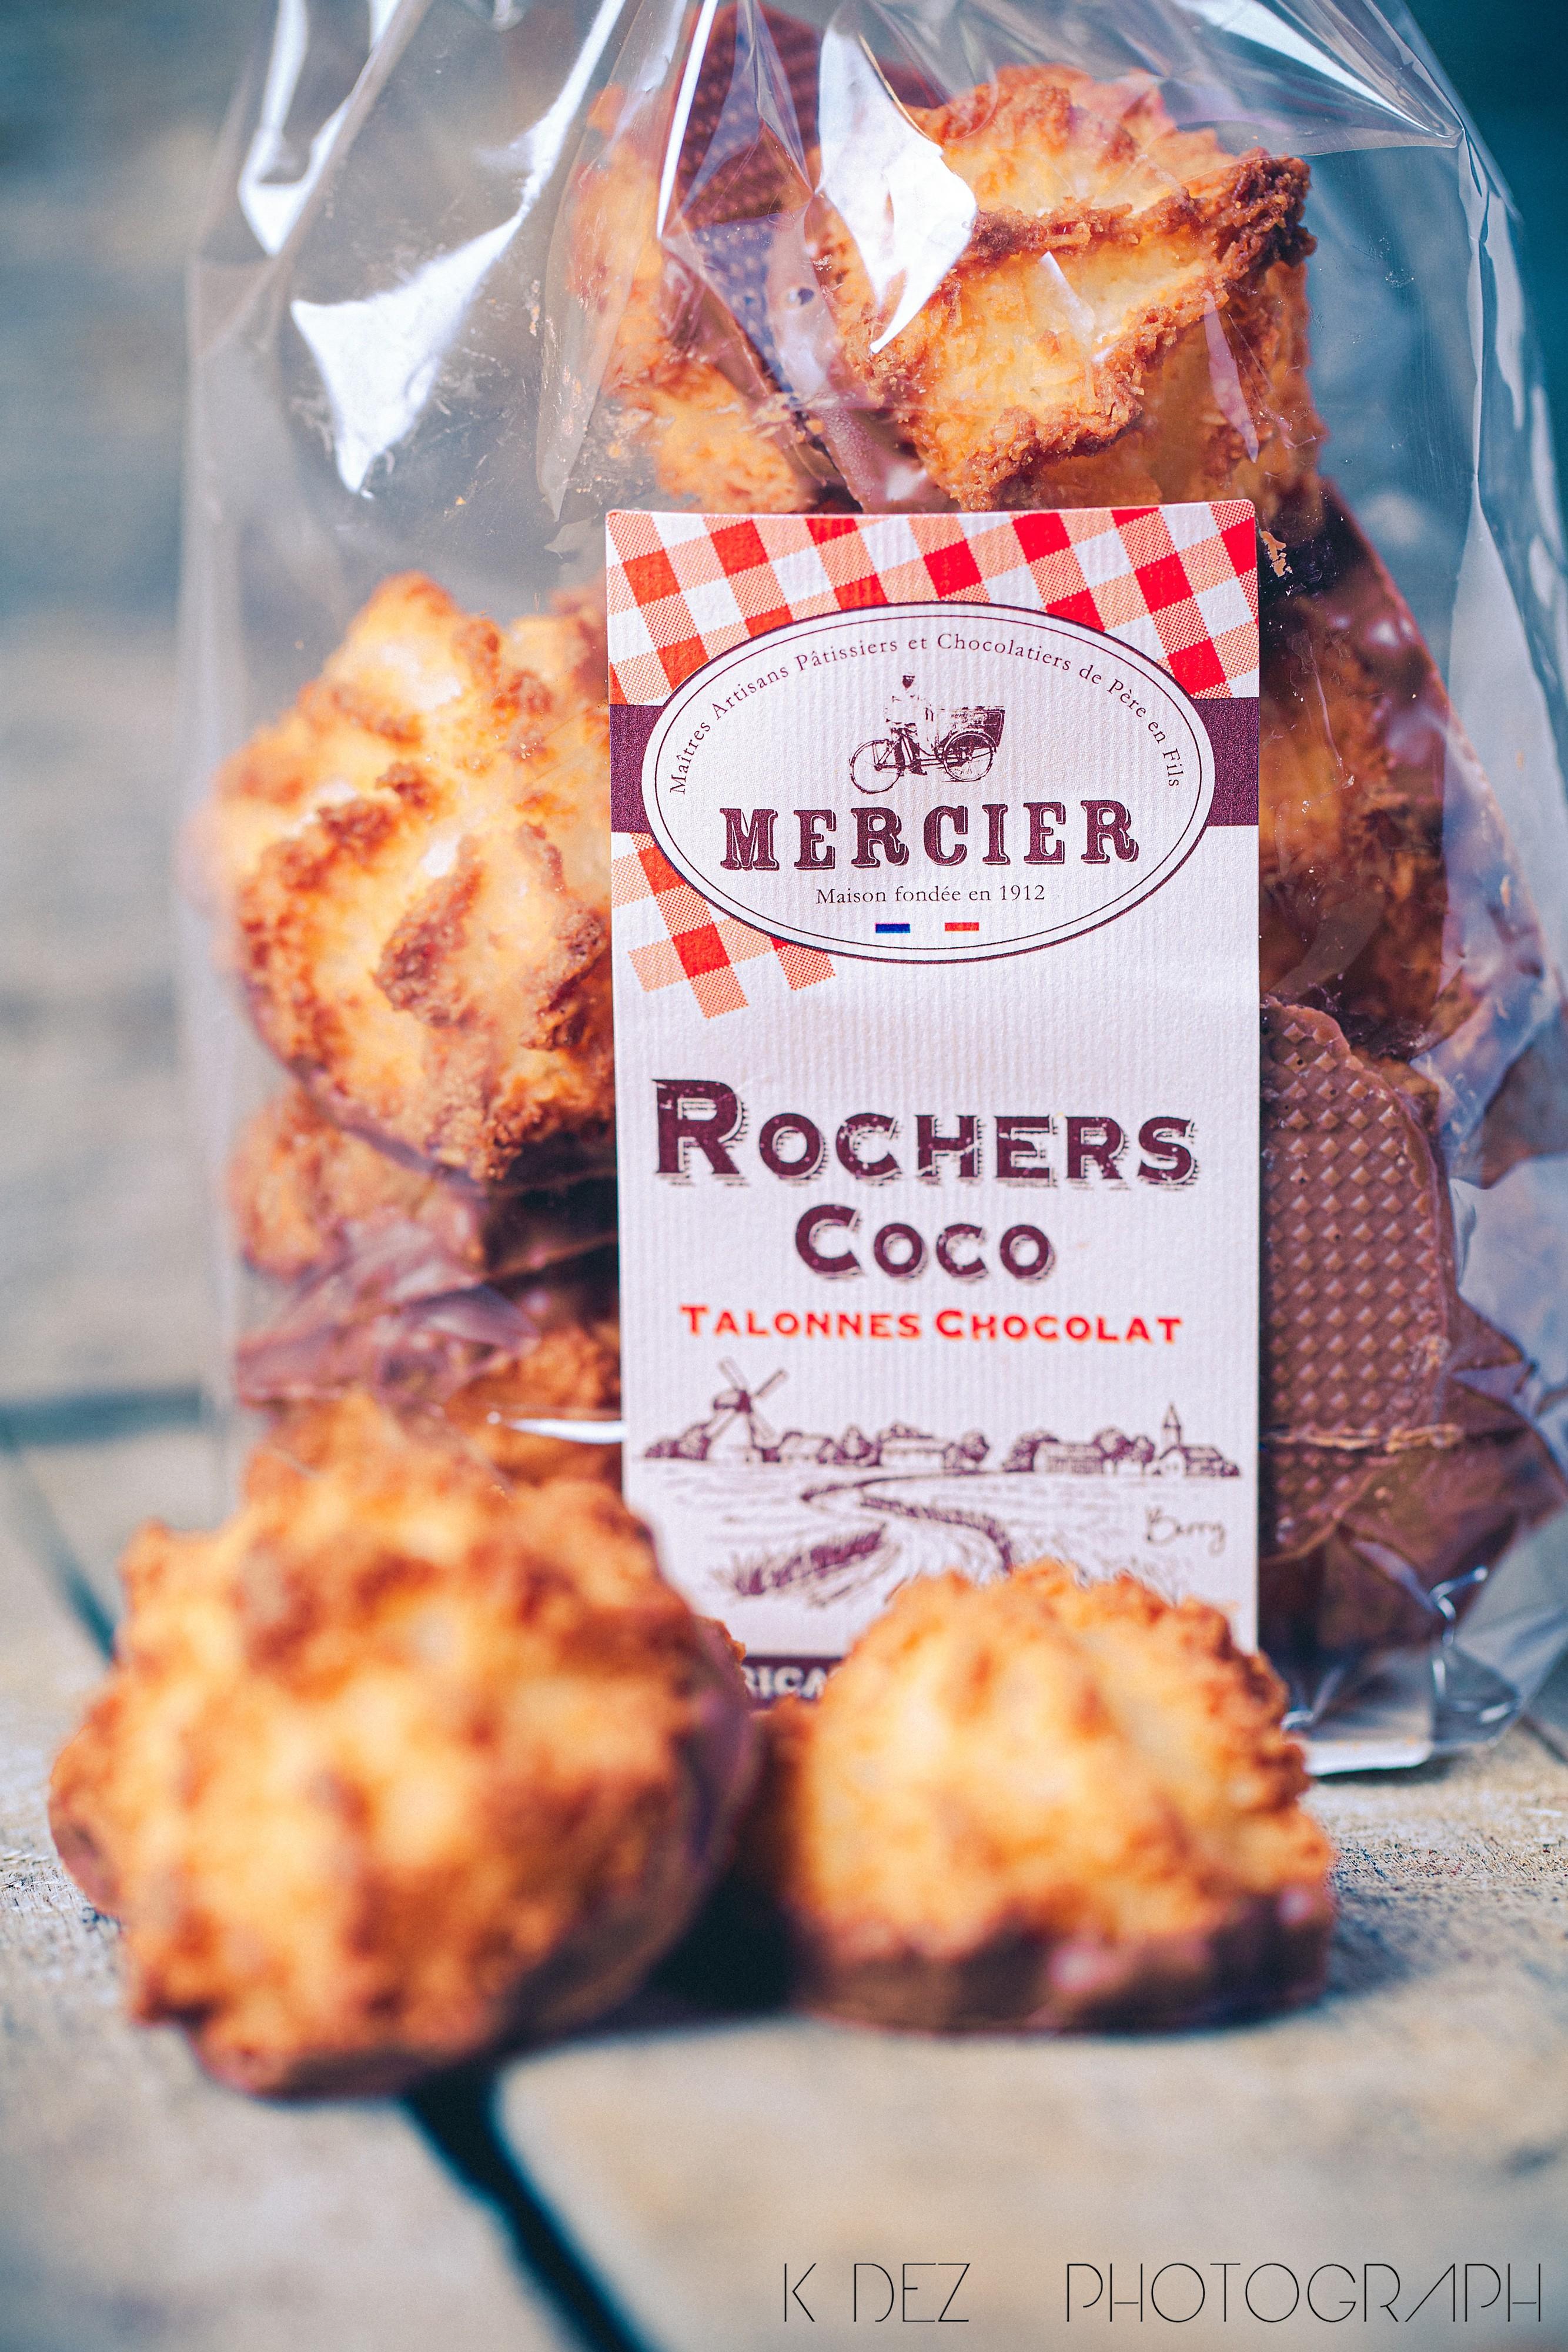 Chocolaterie Mercier